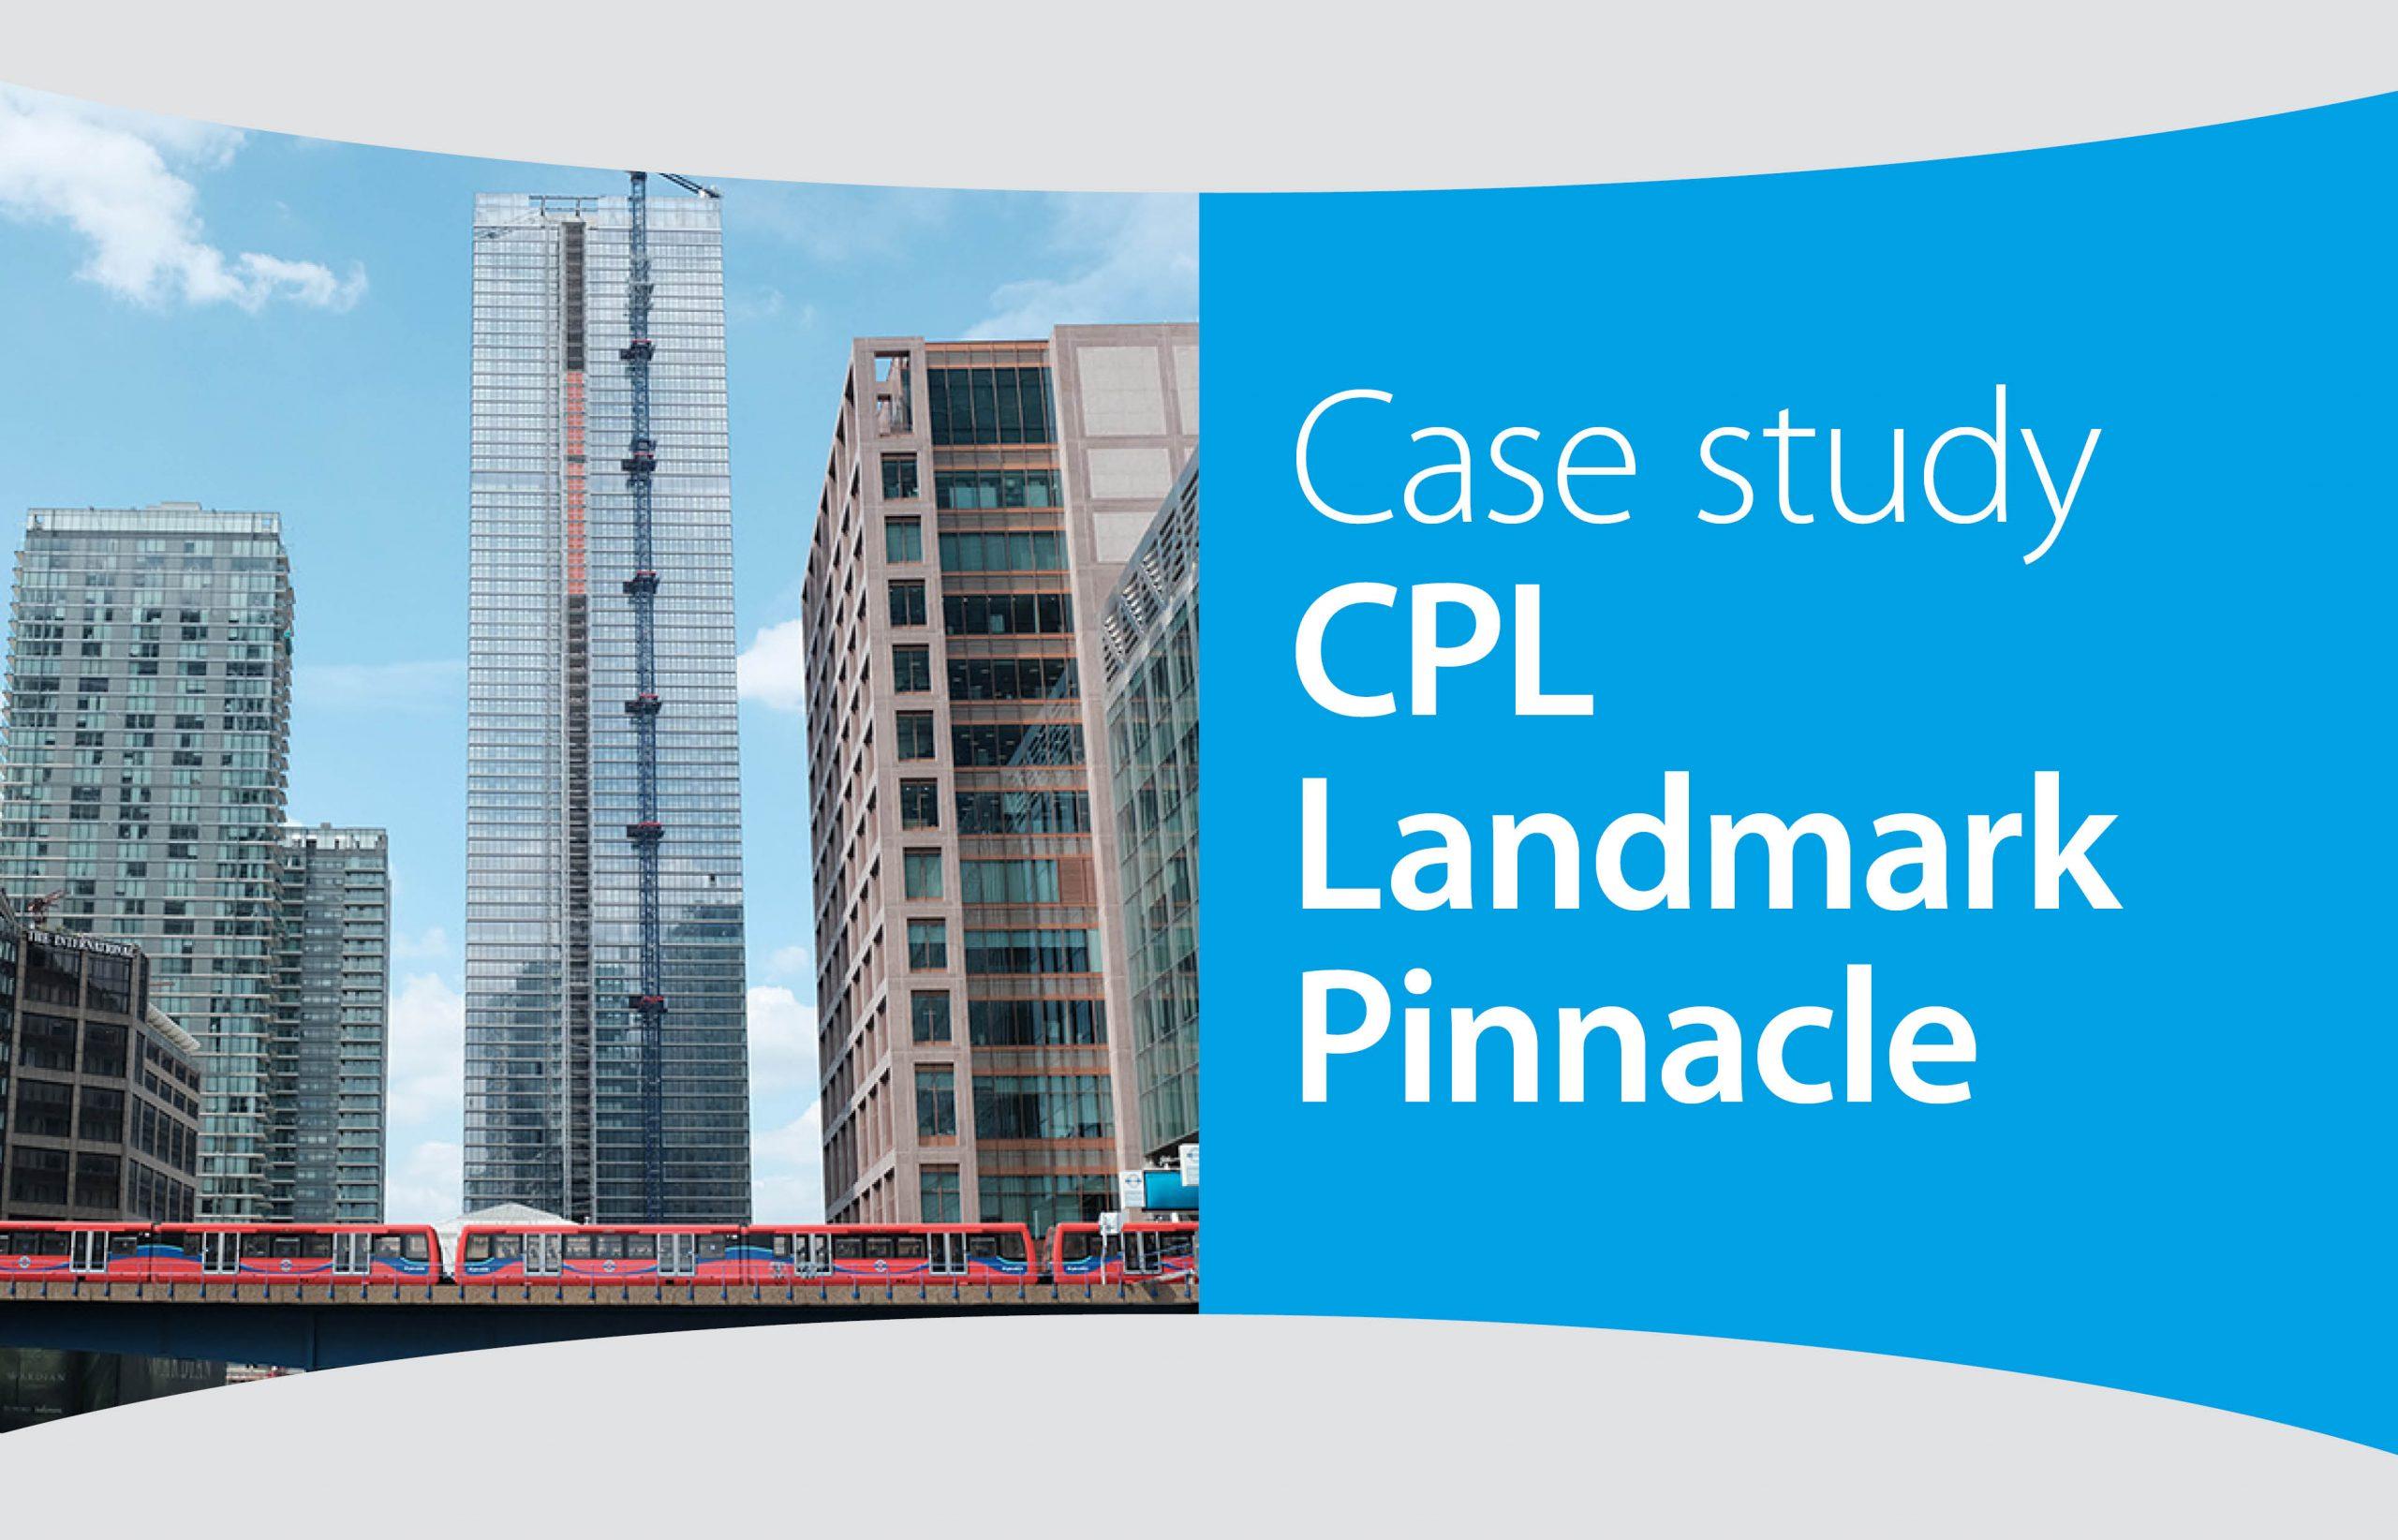 Case study – CPL Landmark Pinnacle